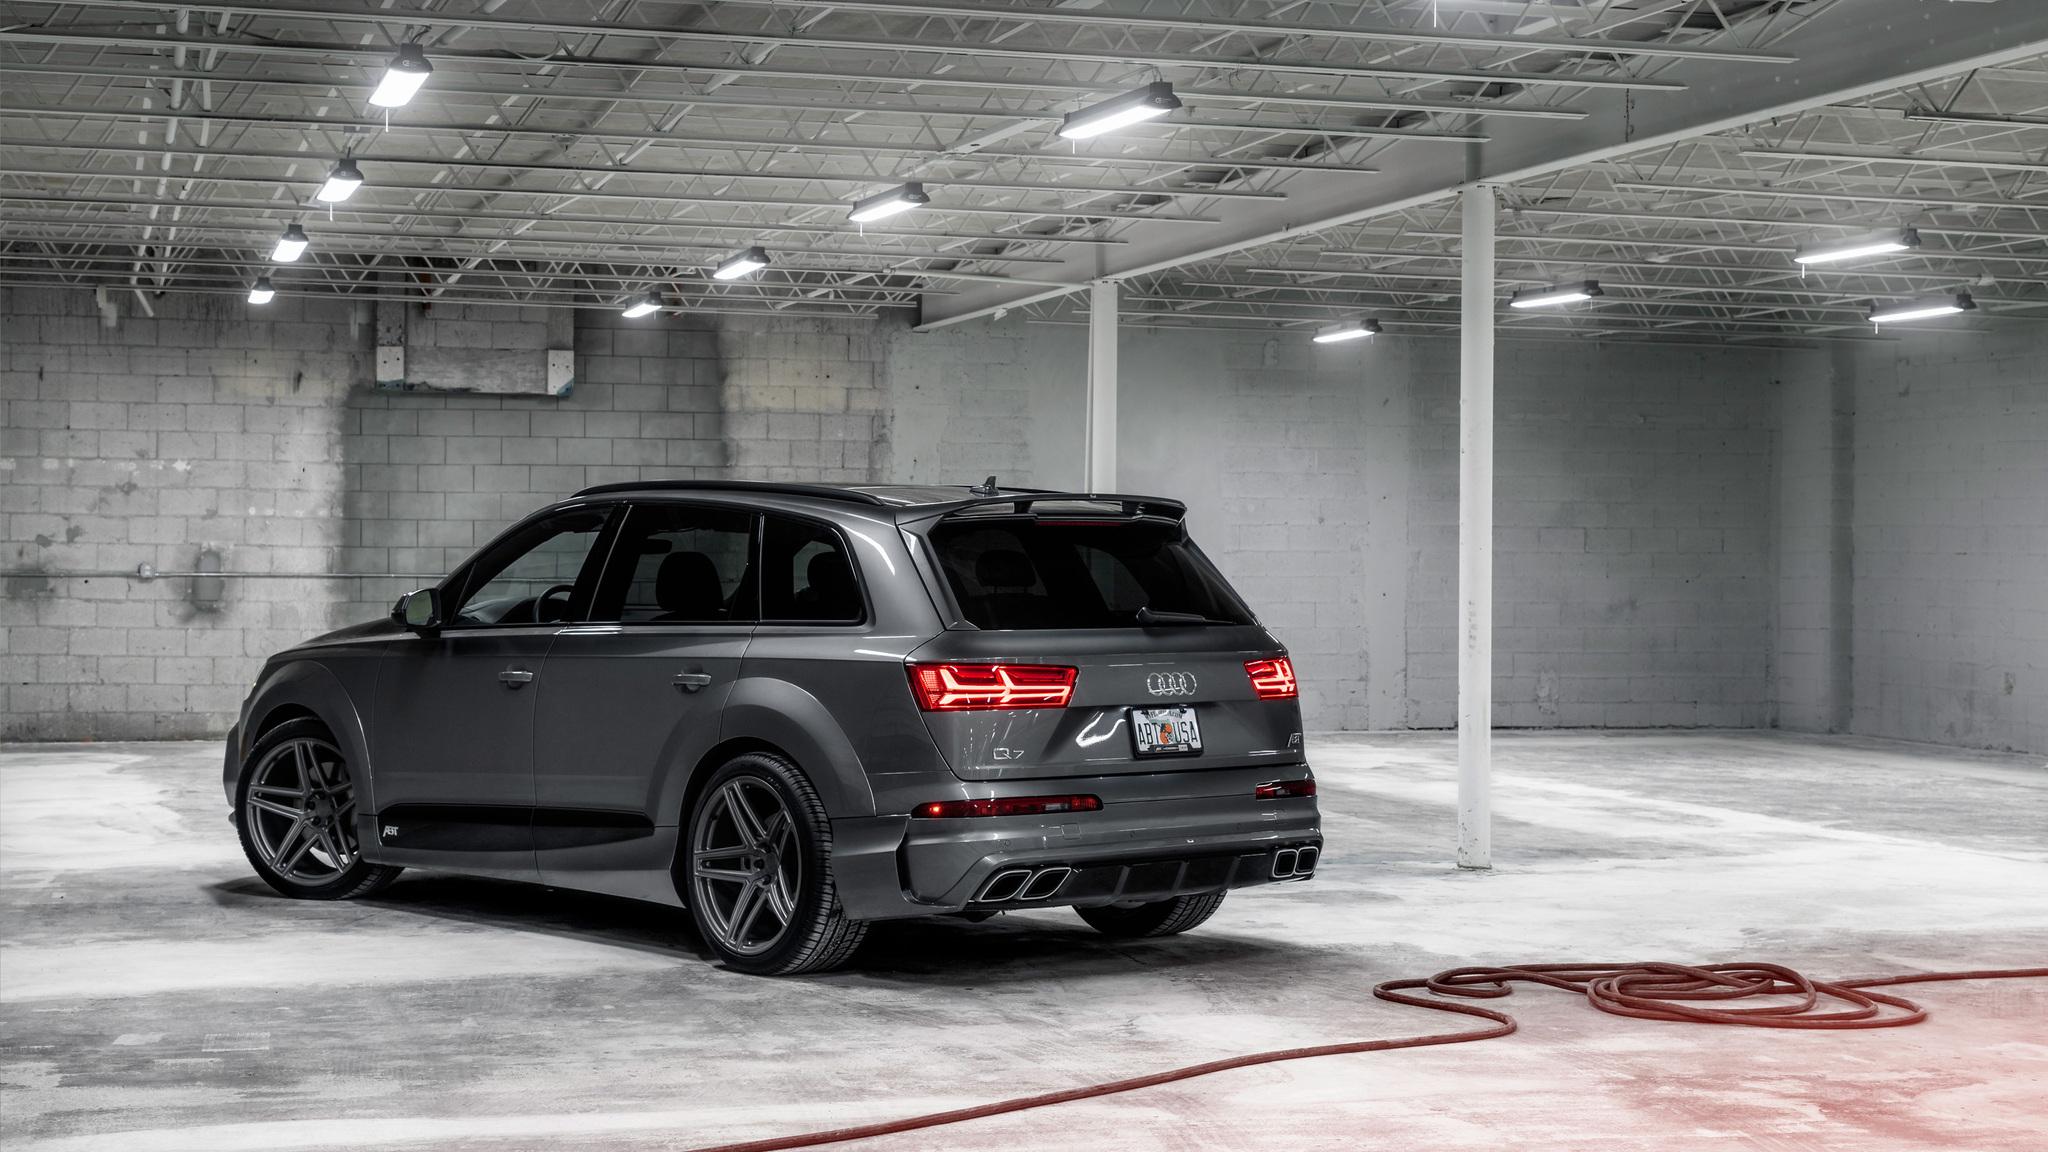 2048x1152 Audi Q7 Abt Vossen 2017 2048x1152 Resolution Hd 4k